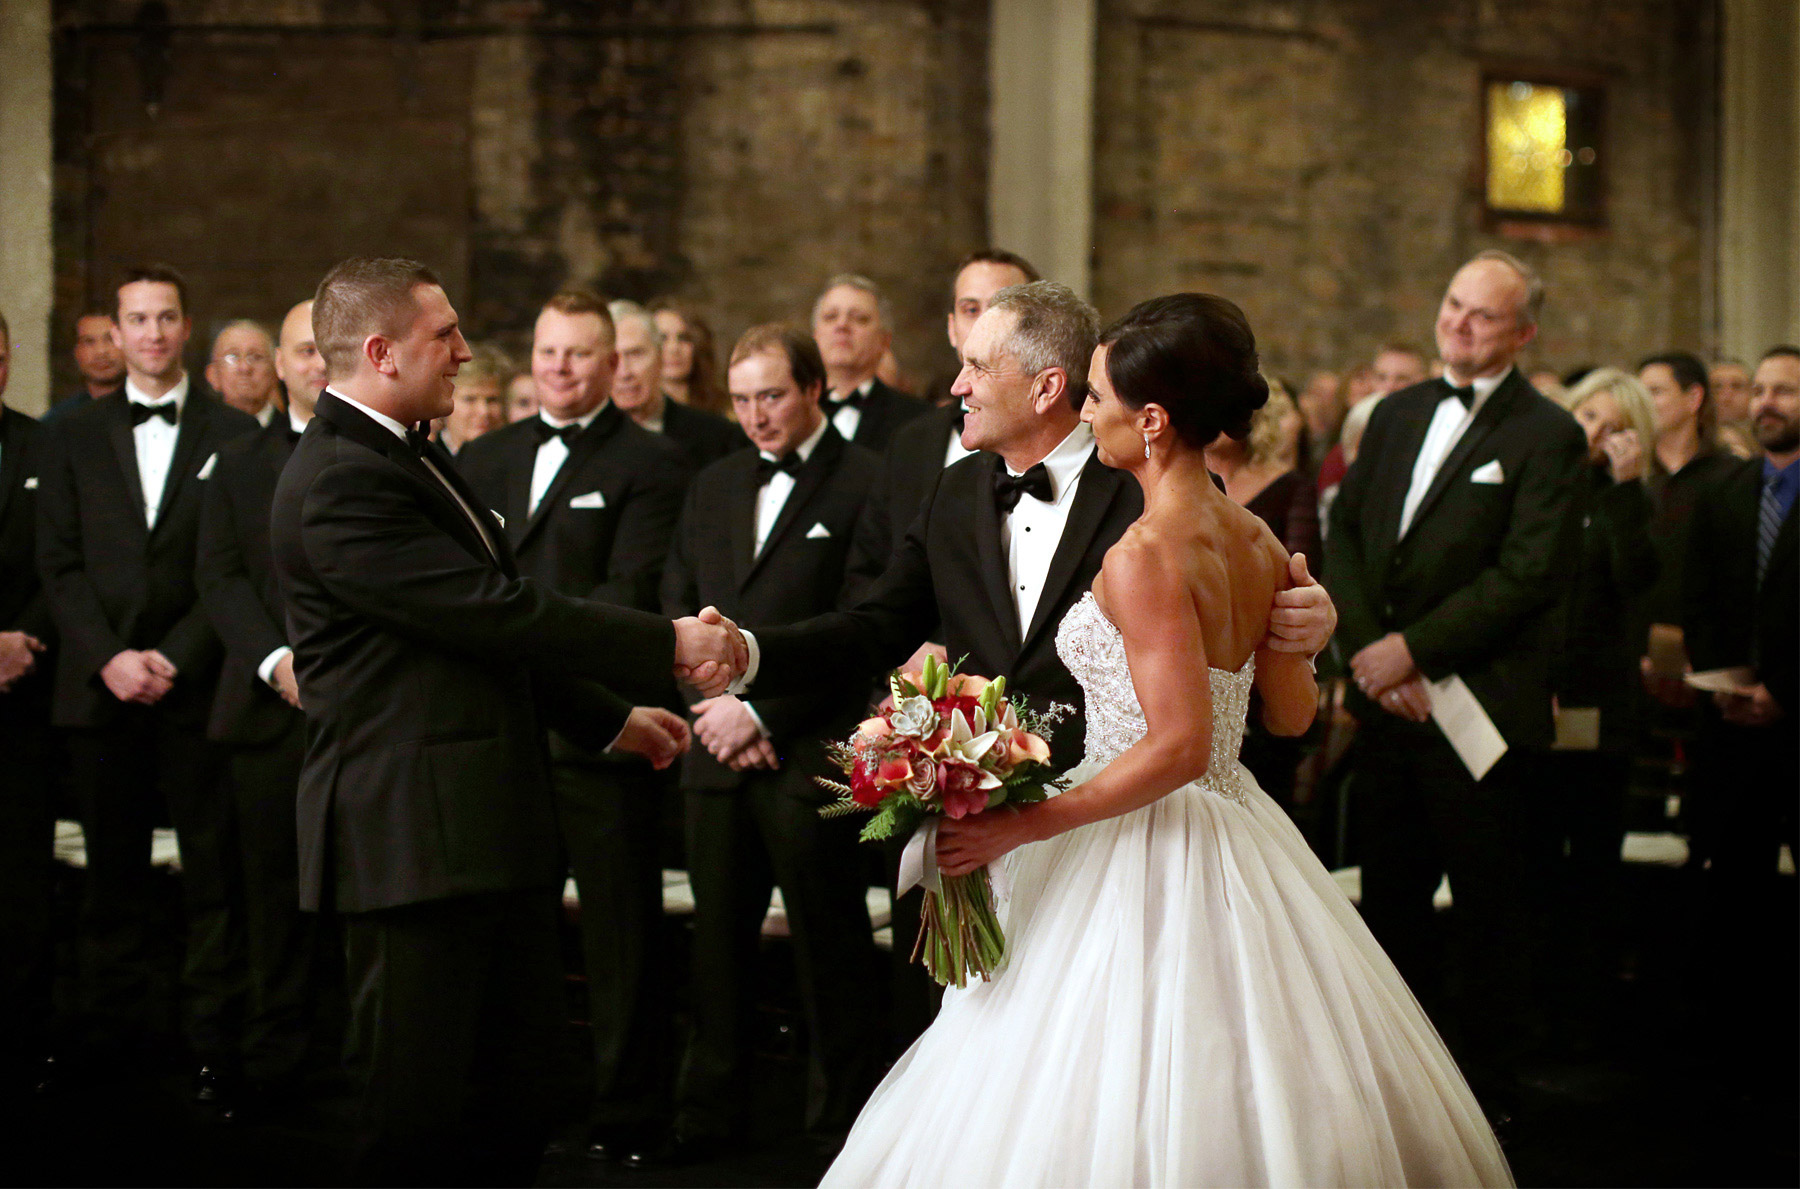 12-Minneapolis-Minnesota-Wedding-Photography-Aria-Downtown-Industrial-Ceremony-Melanie-and-Andrew.jpg